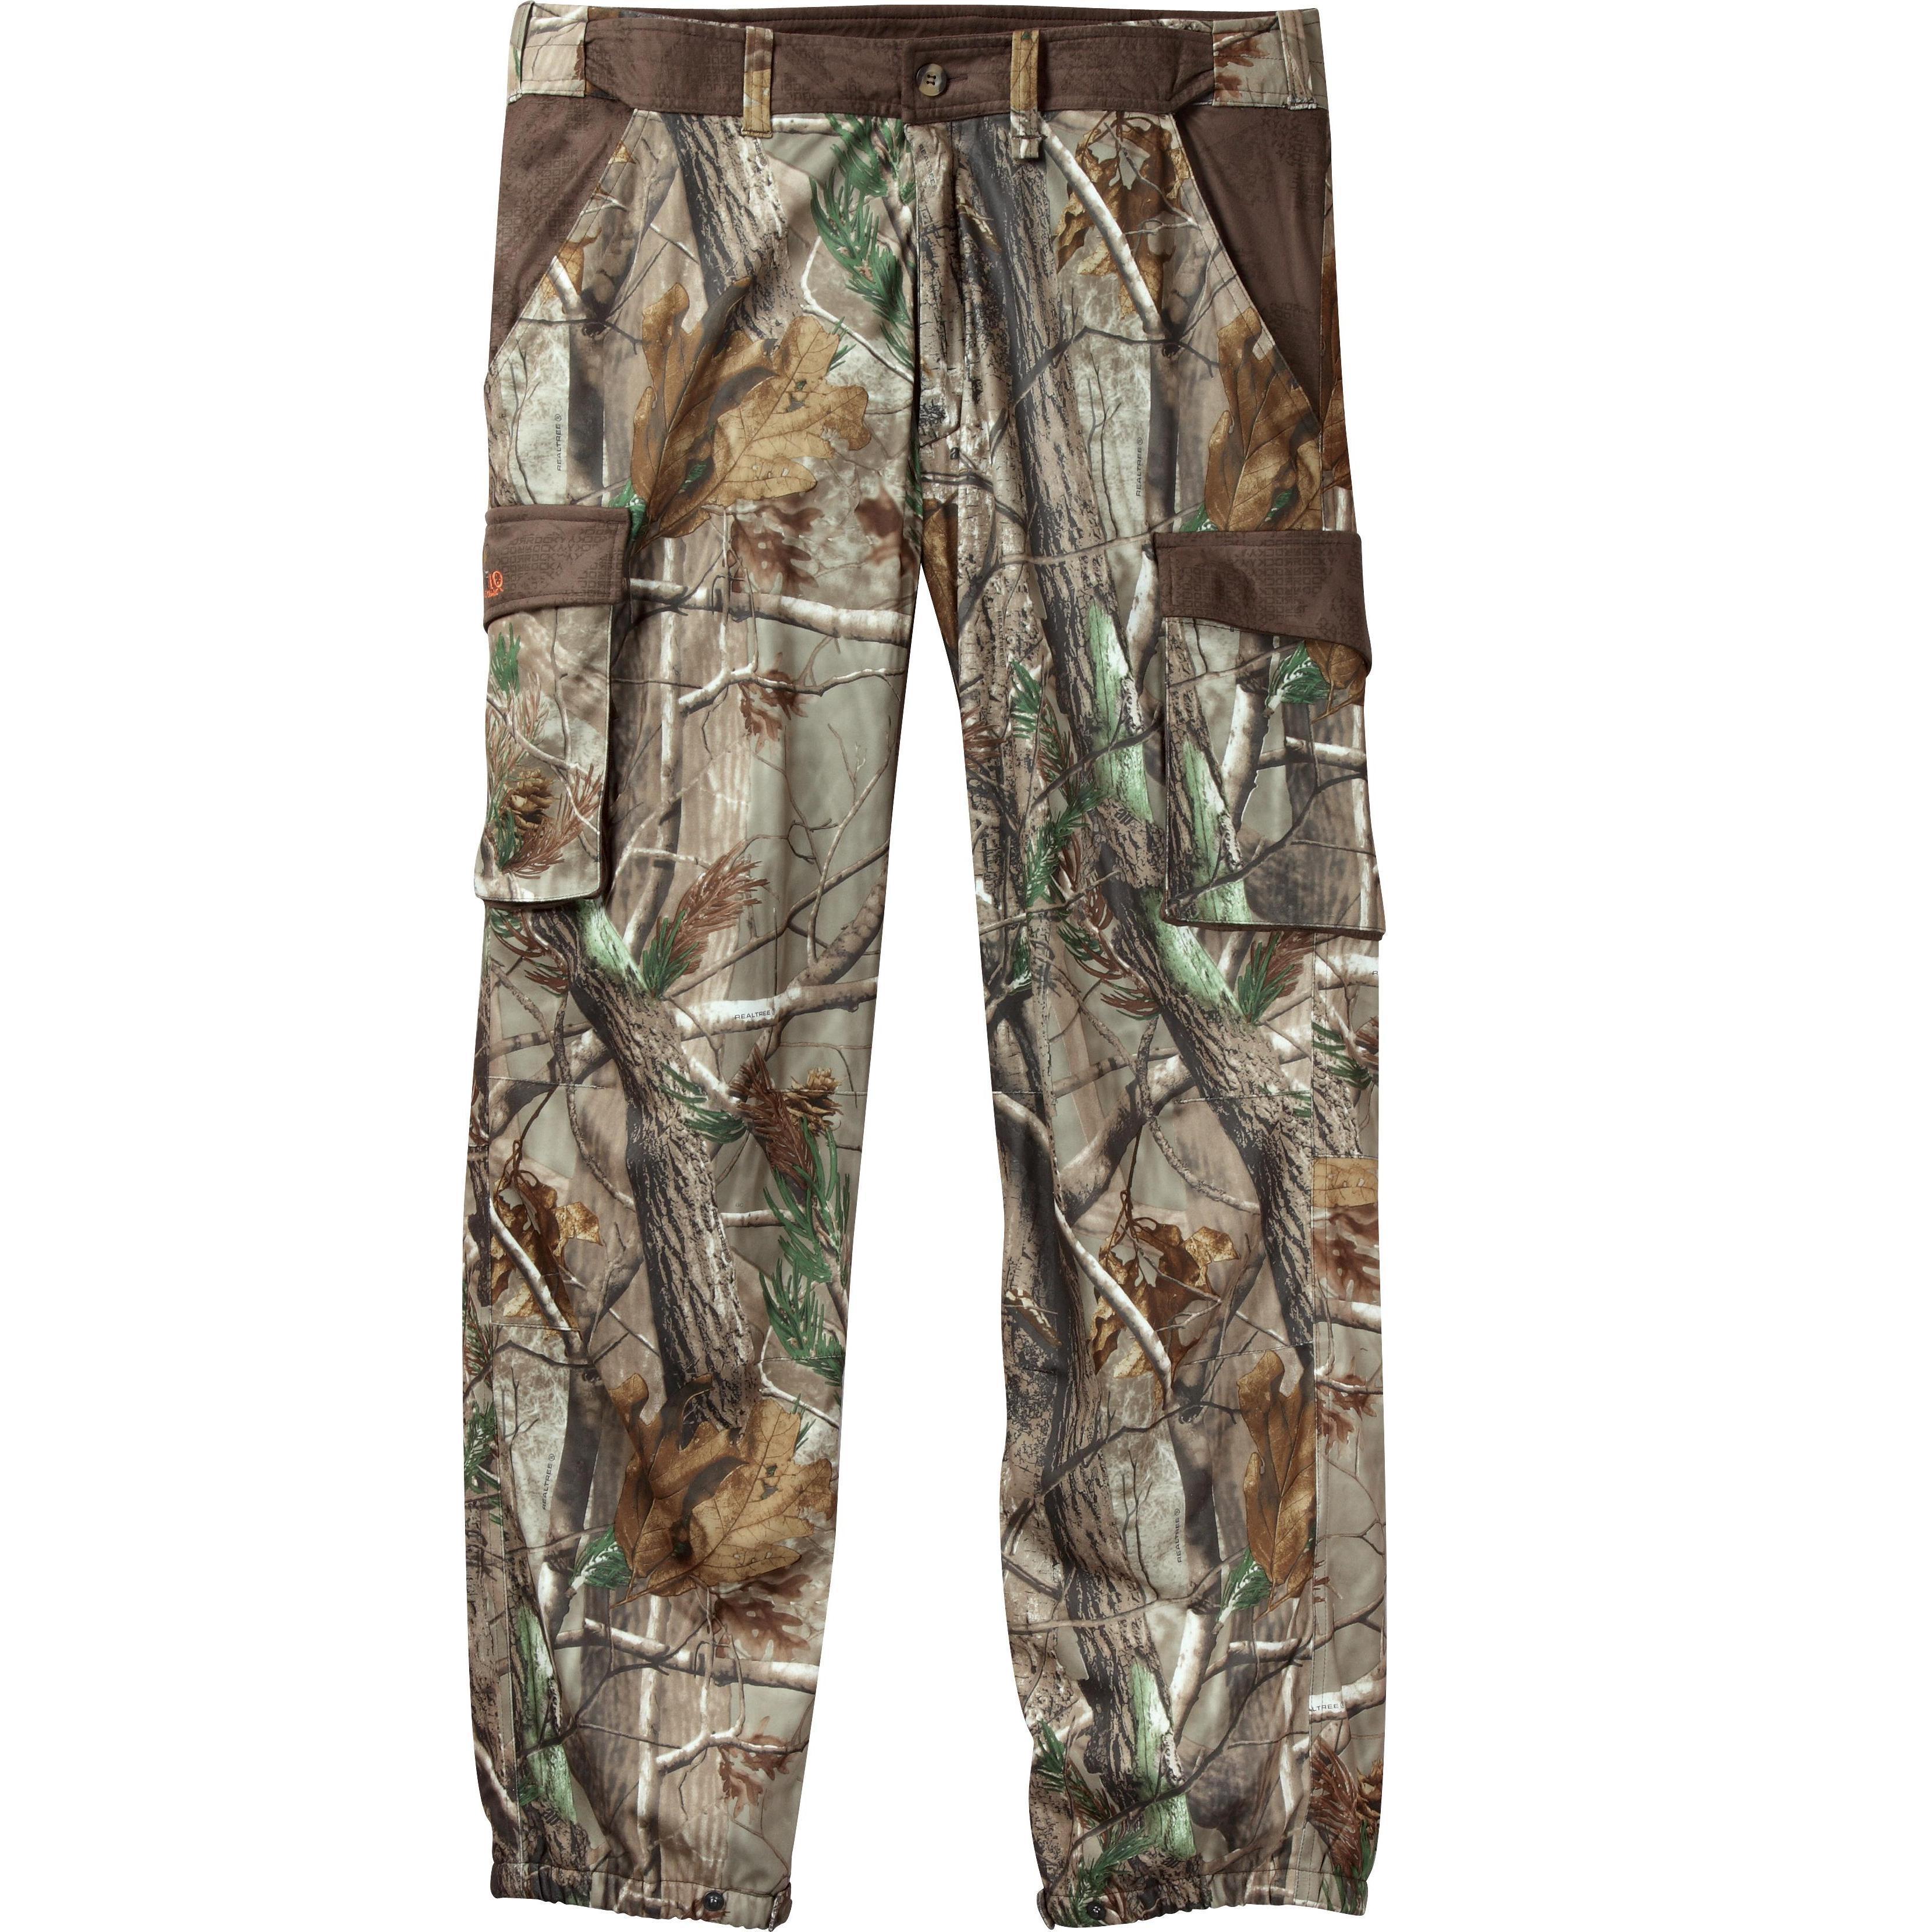 Rocky broadhead pants realtree ap large